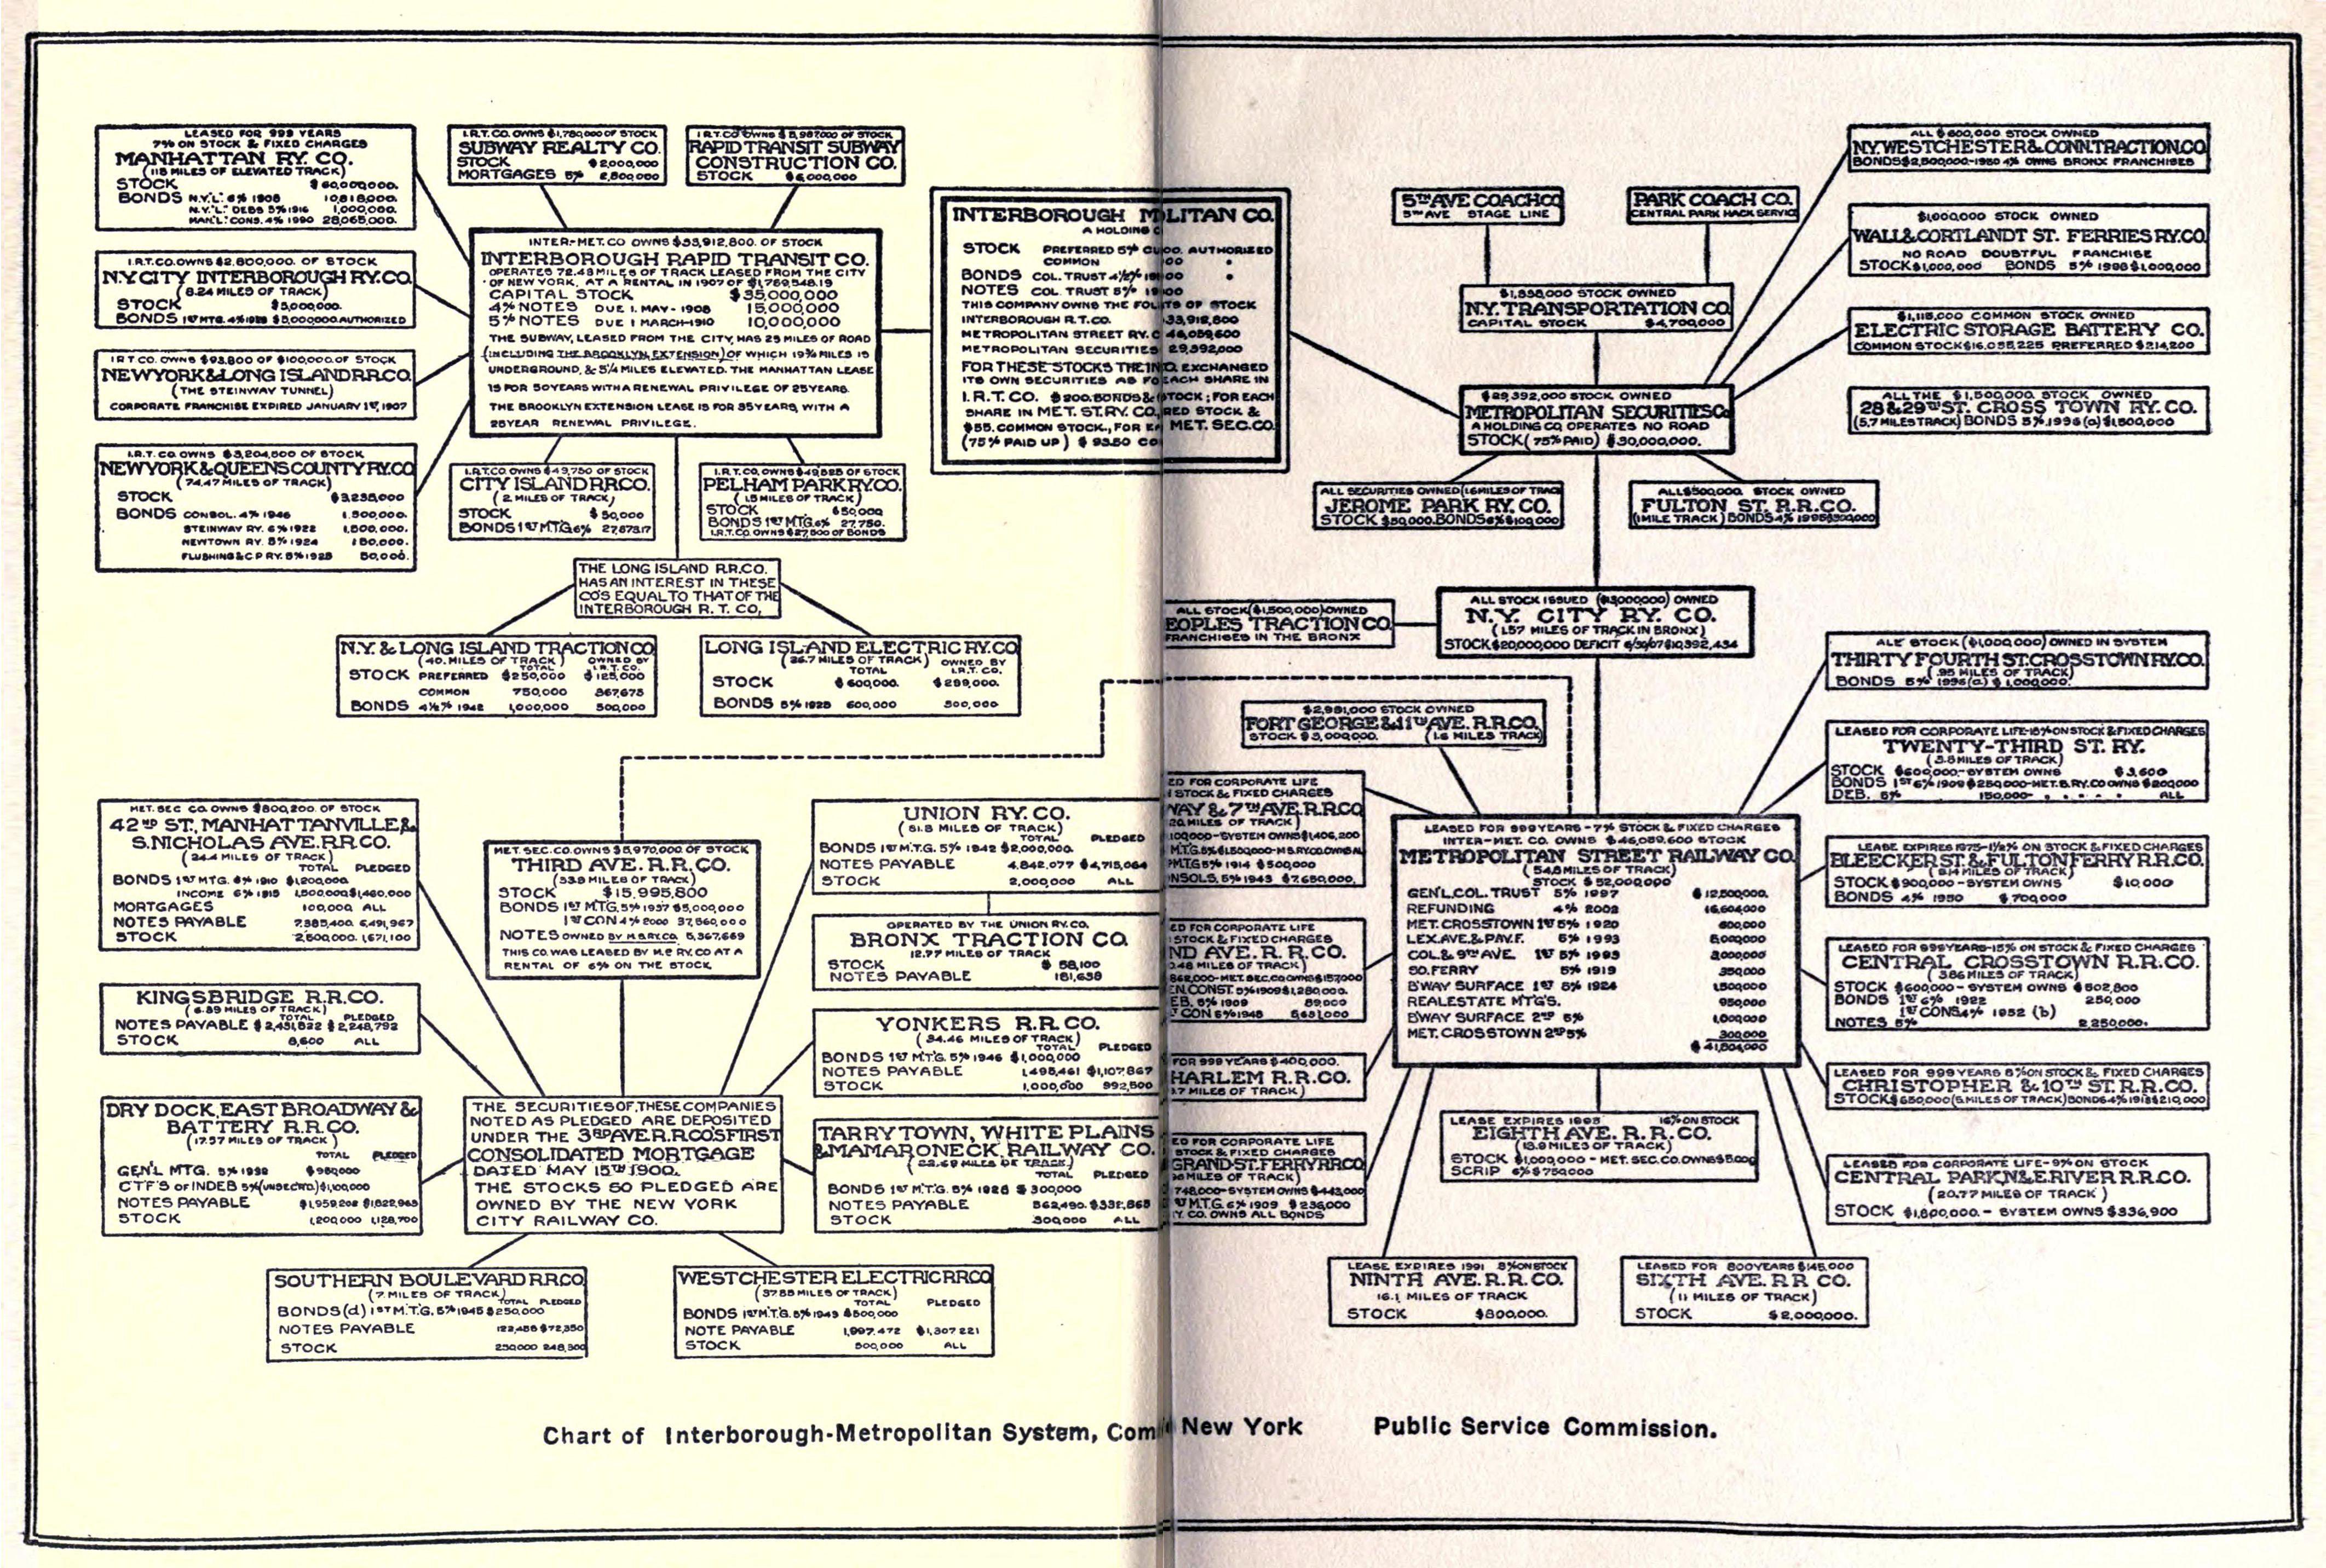 It Works Payment Chart: Chart of Interborough-Metropolitan System New York 1909.jpg ,Chart